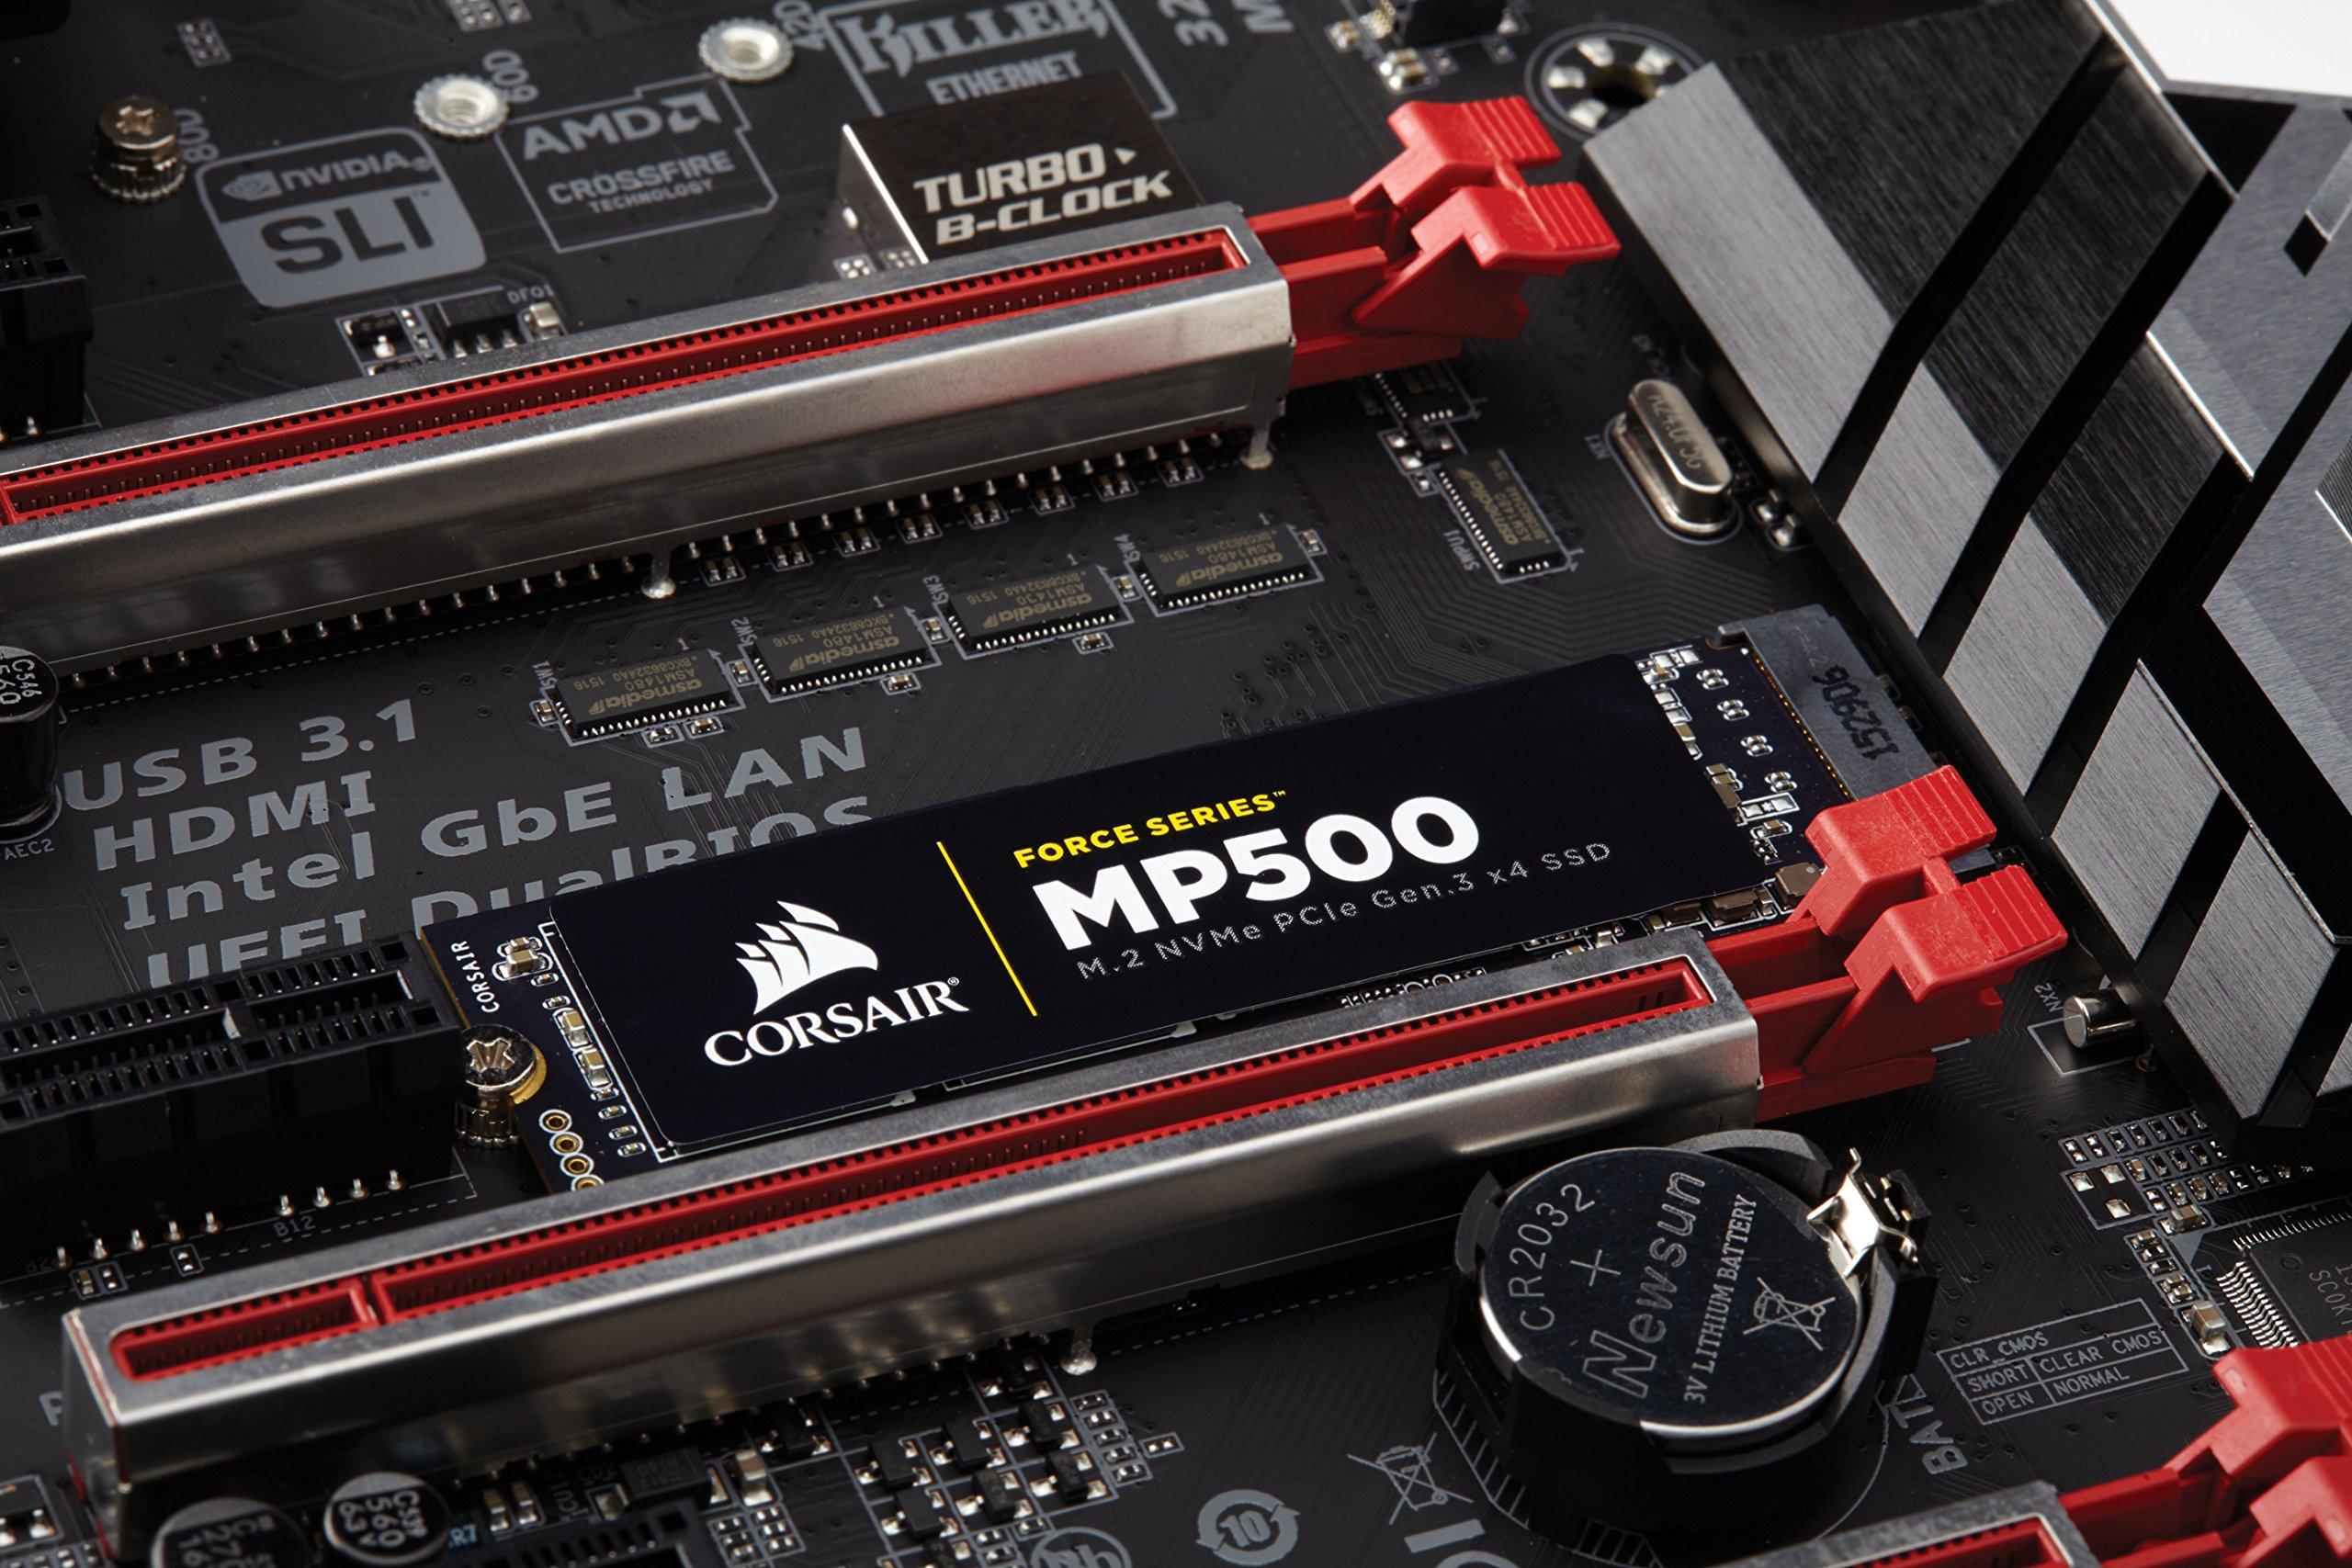 Corsair Force Series MP500 240GB M.2 NVMe PCIe Gen. 3 x4 SSD by Corsair (Image #8)